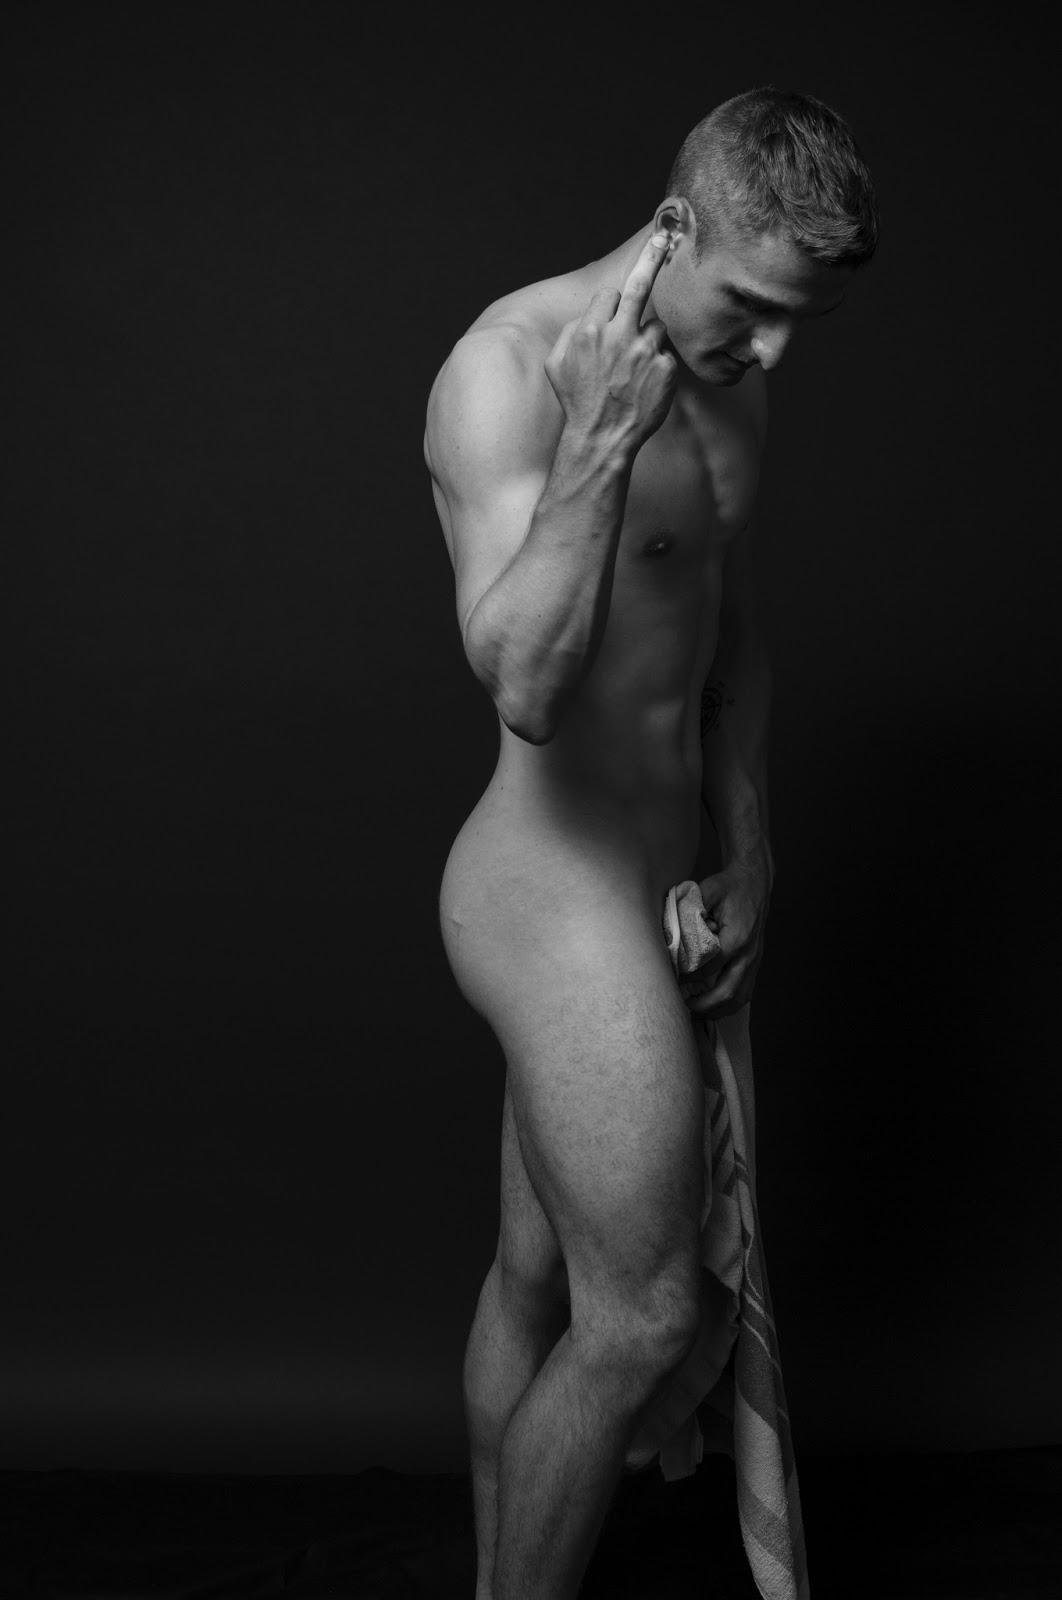 JacoB's WorlD, by PHANTASMA PHOTOGRAPHY ft Jacob Korpan (NSFW).